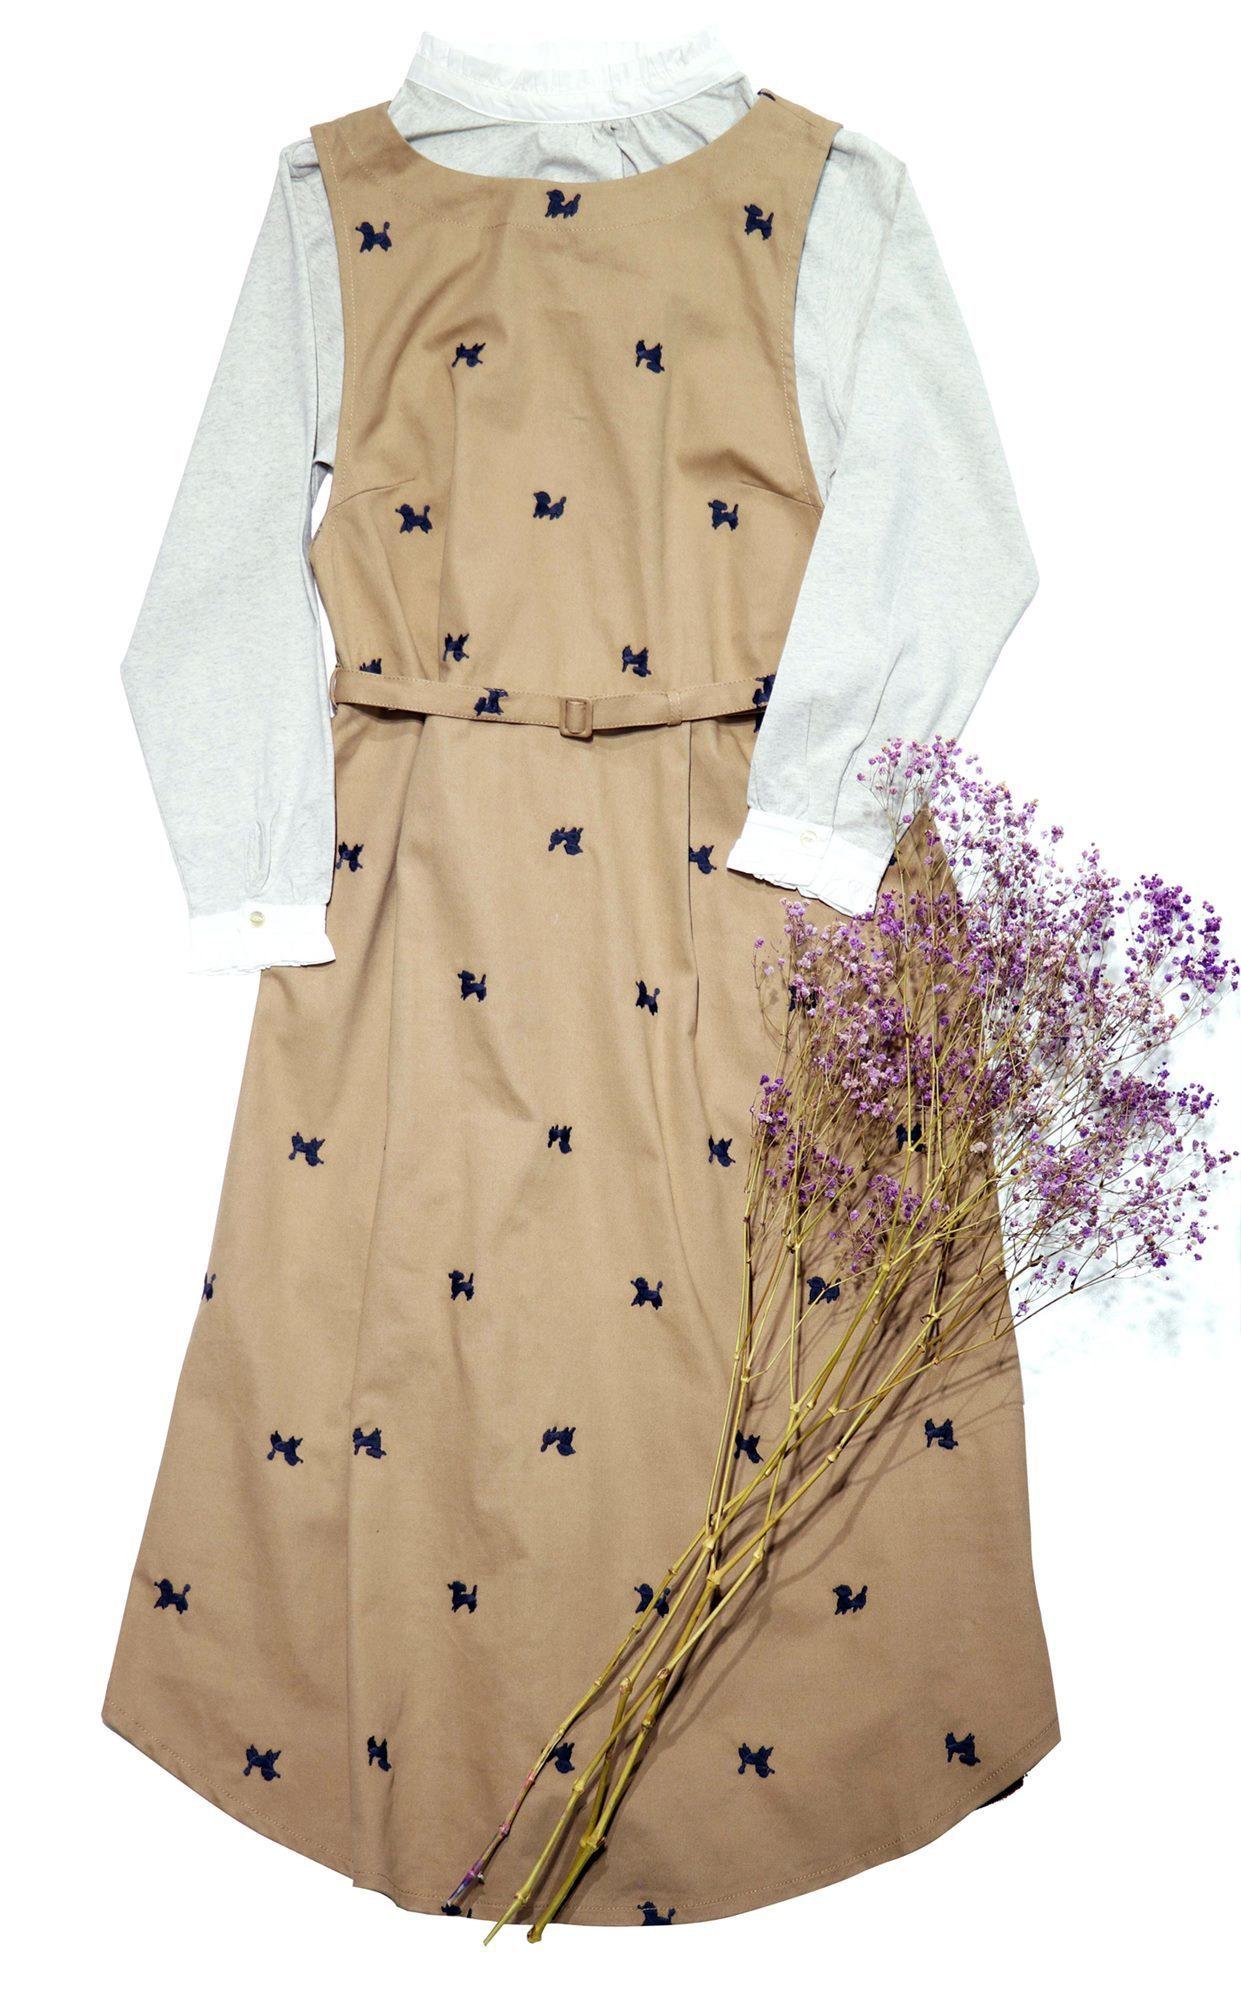 POU DOU DOU「森林少女系的」設計風格呼應品牌名取自鳥叫聲的概念,風格清...